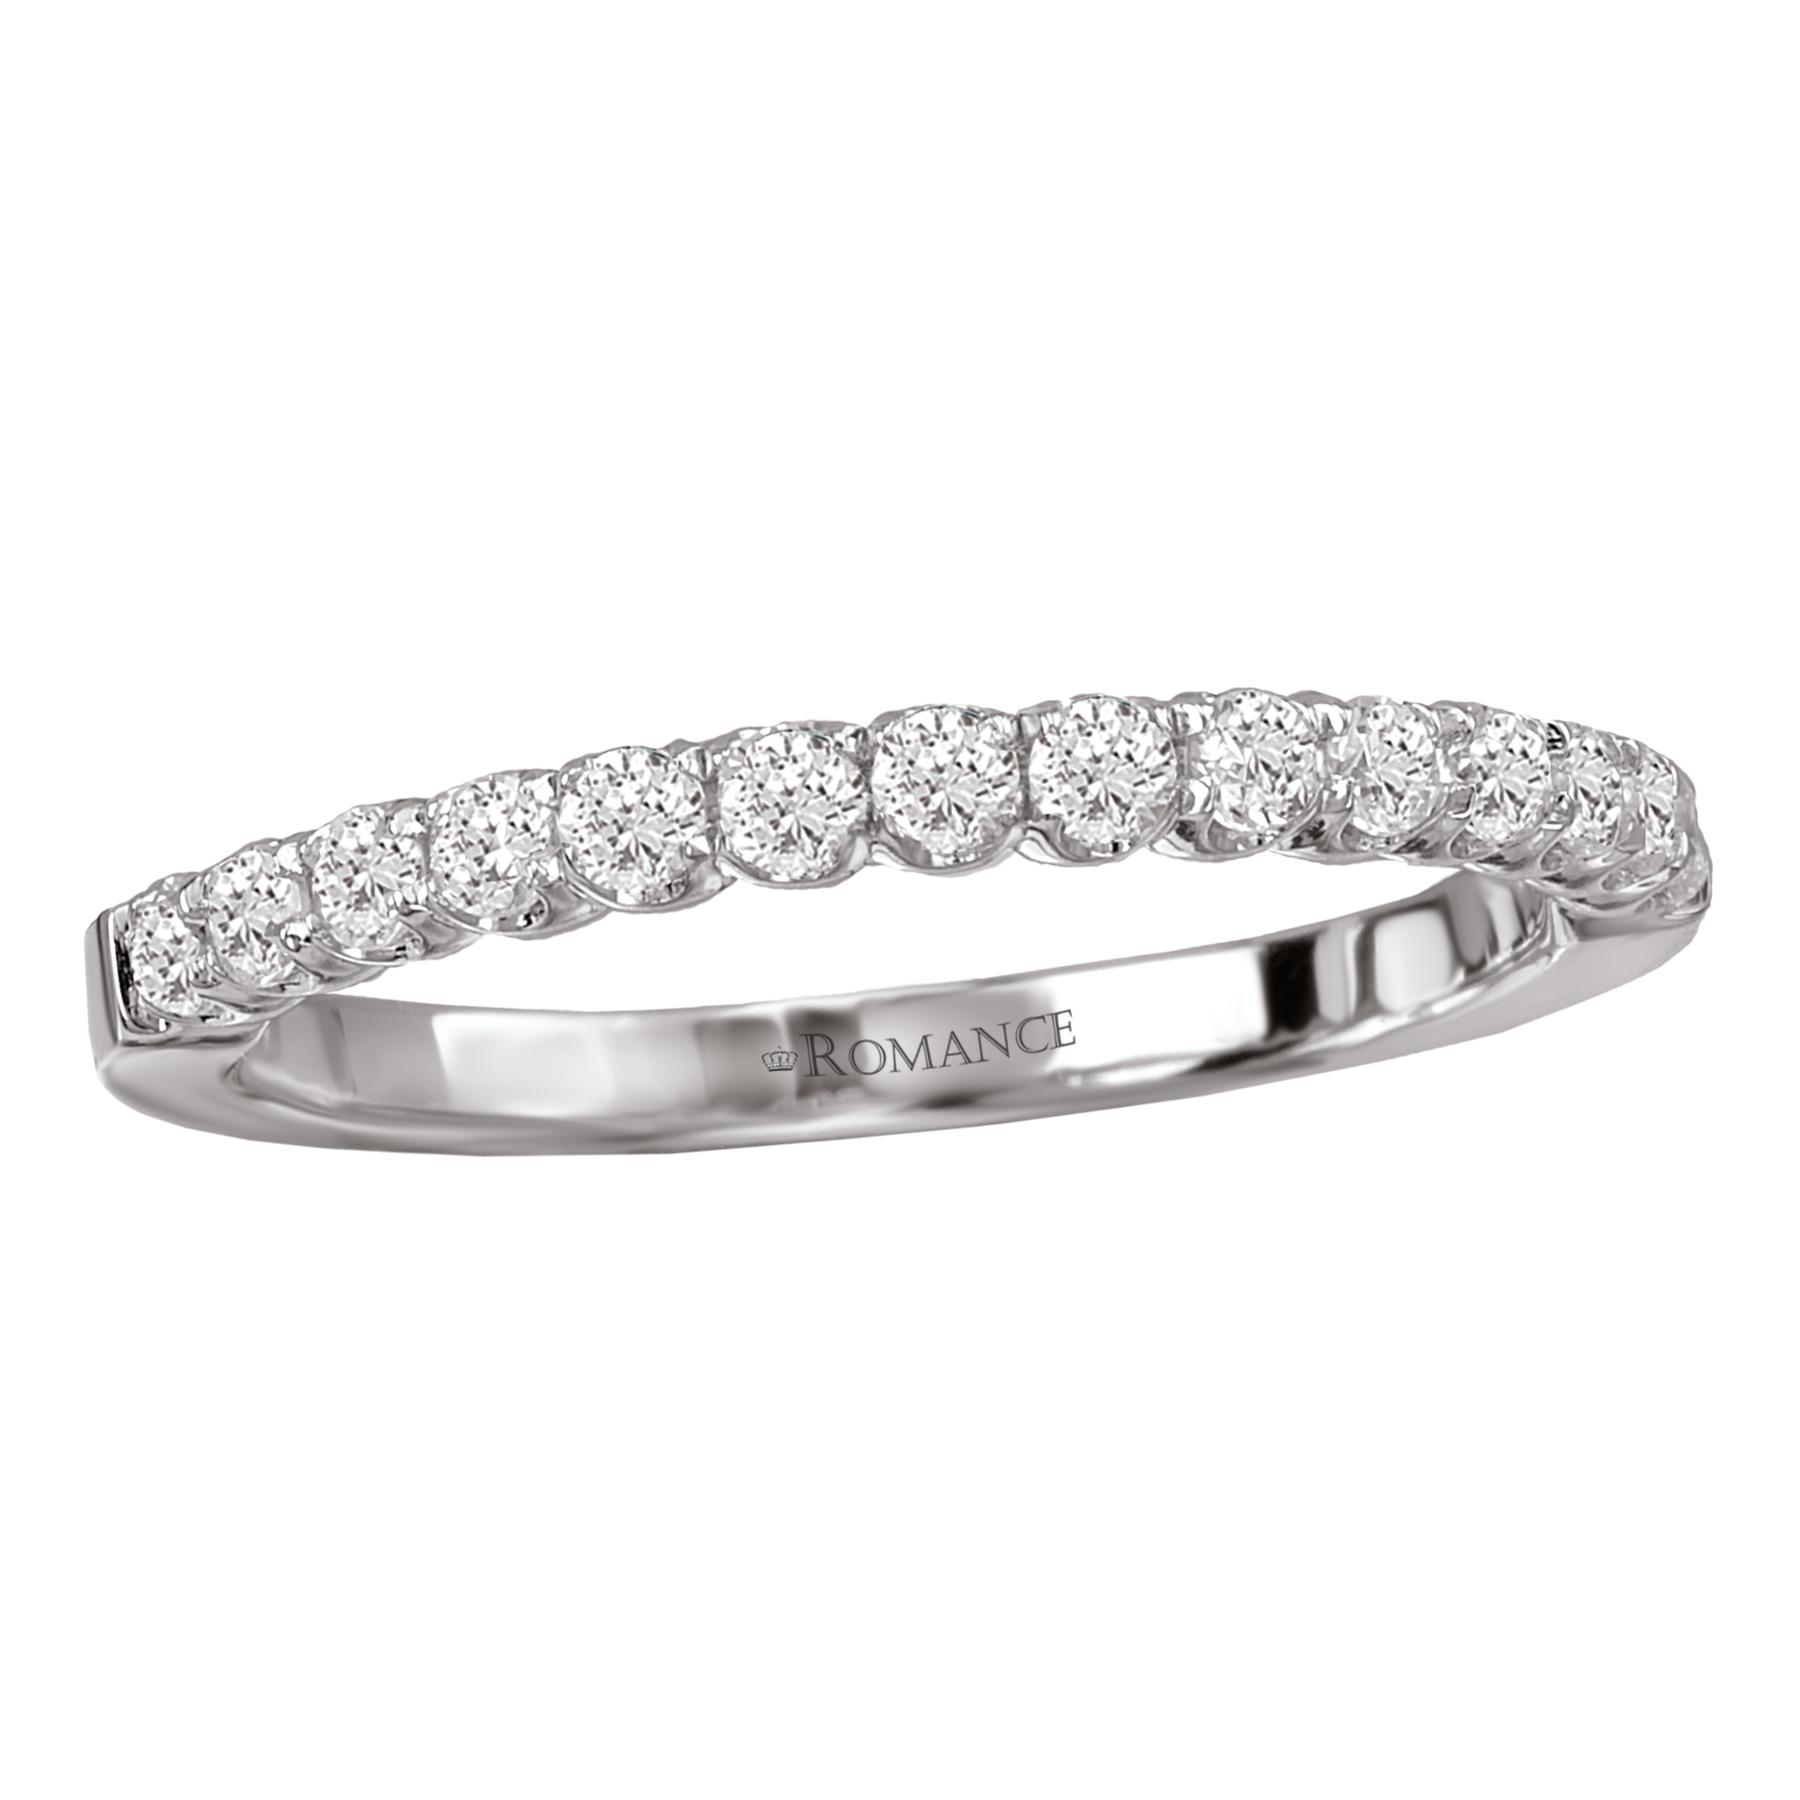 Romance Wedding Bands 117478-W product image